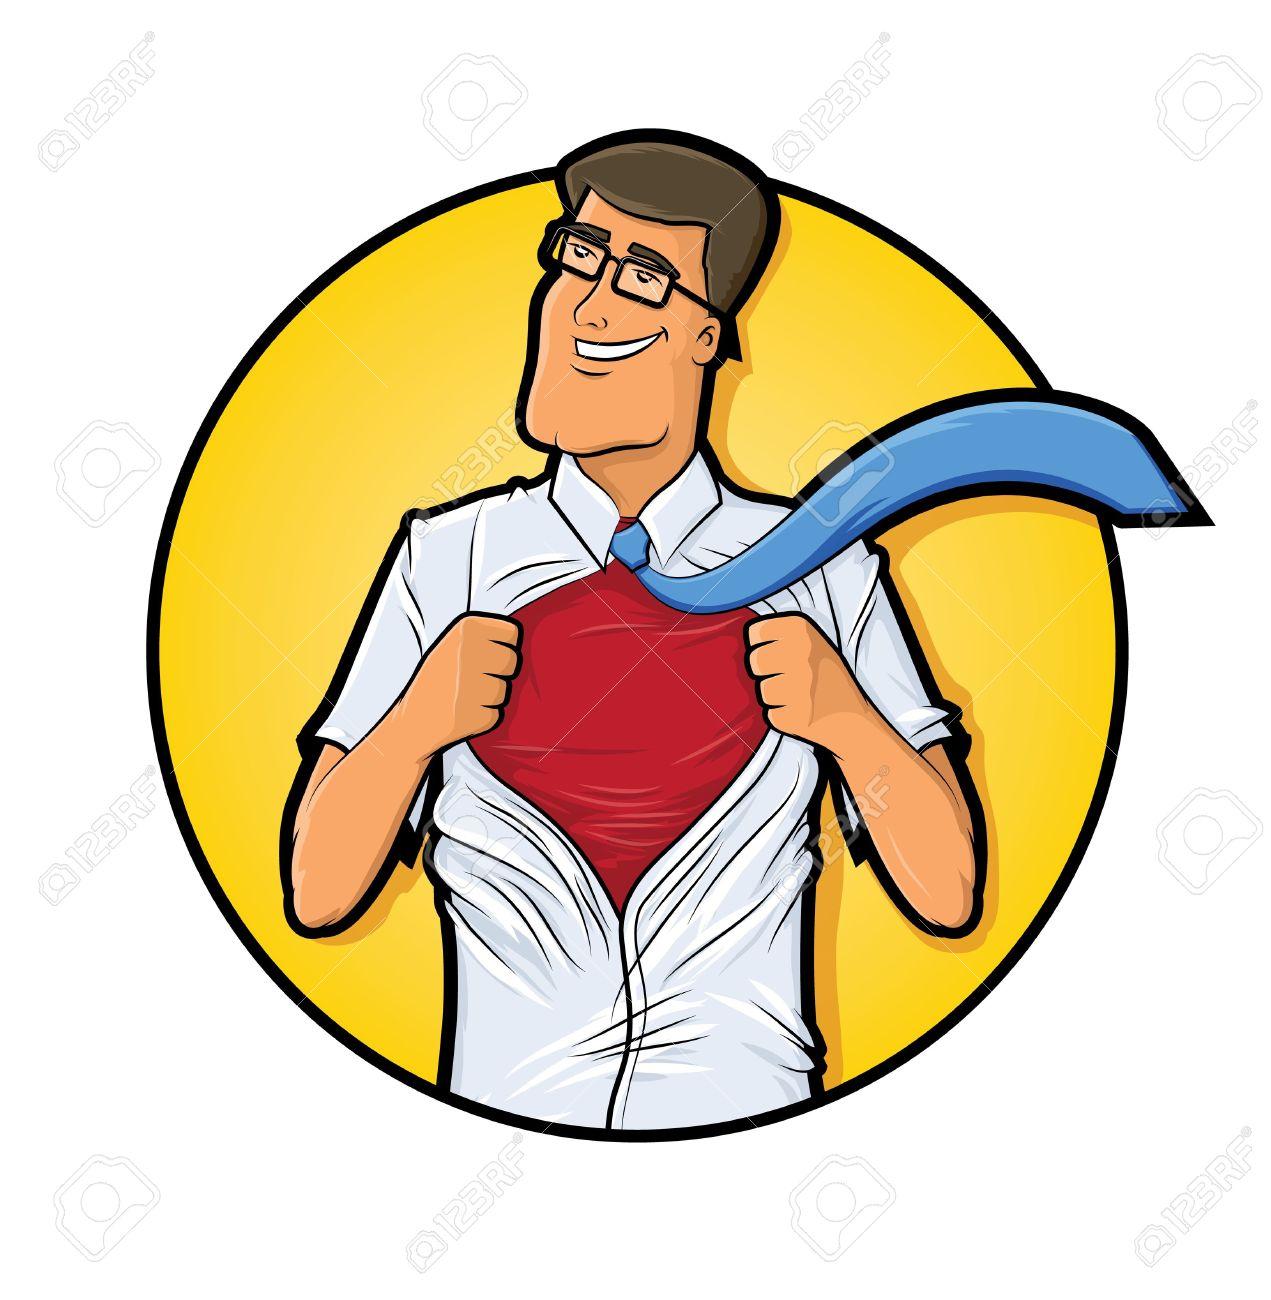 Superman chest logo clipart banner Chest ripped shirt logo clipart - ClipartFest banner